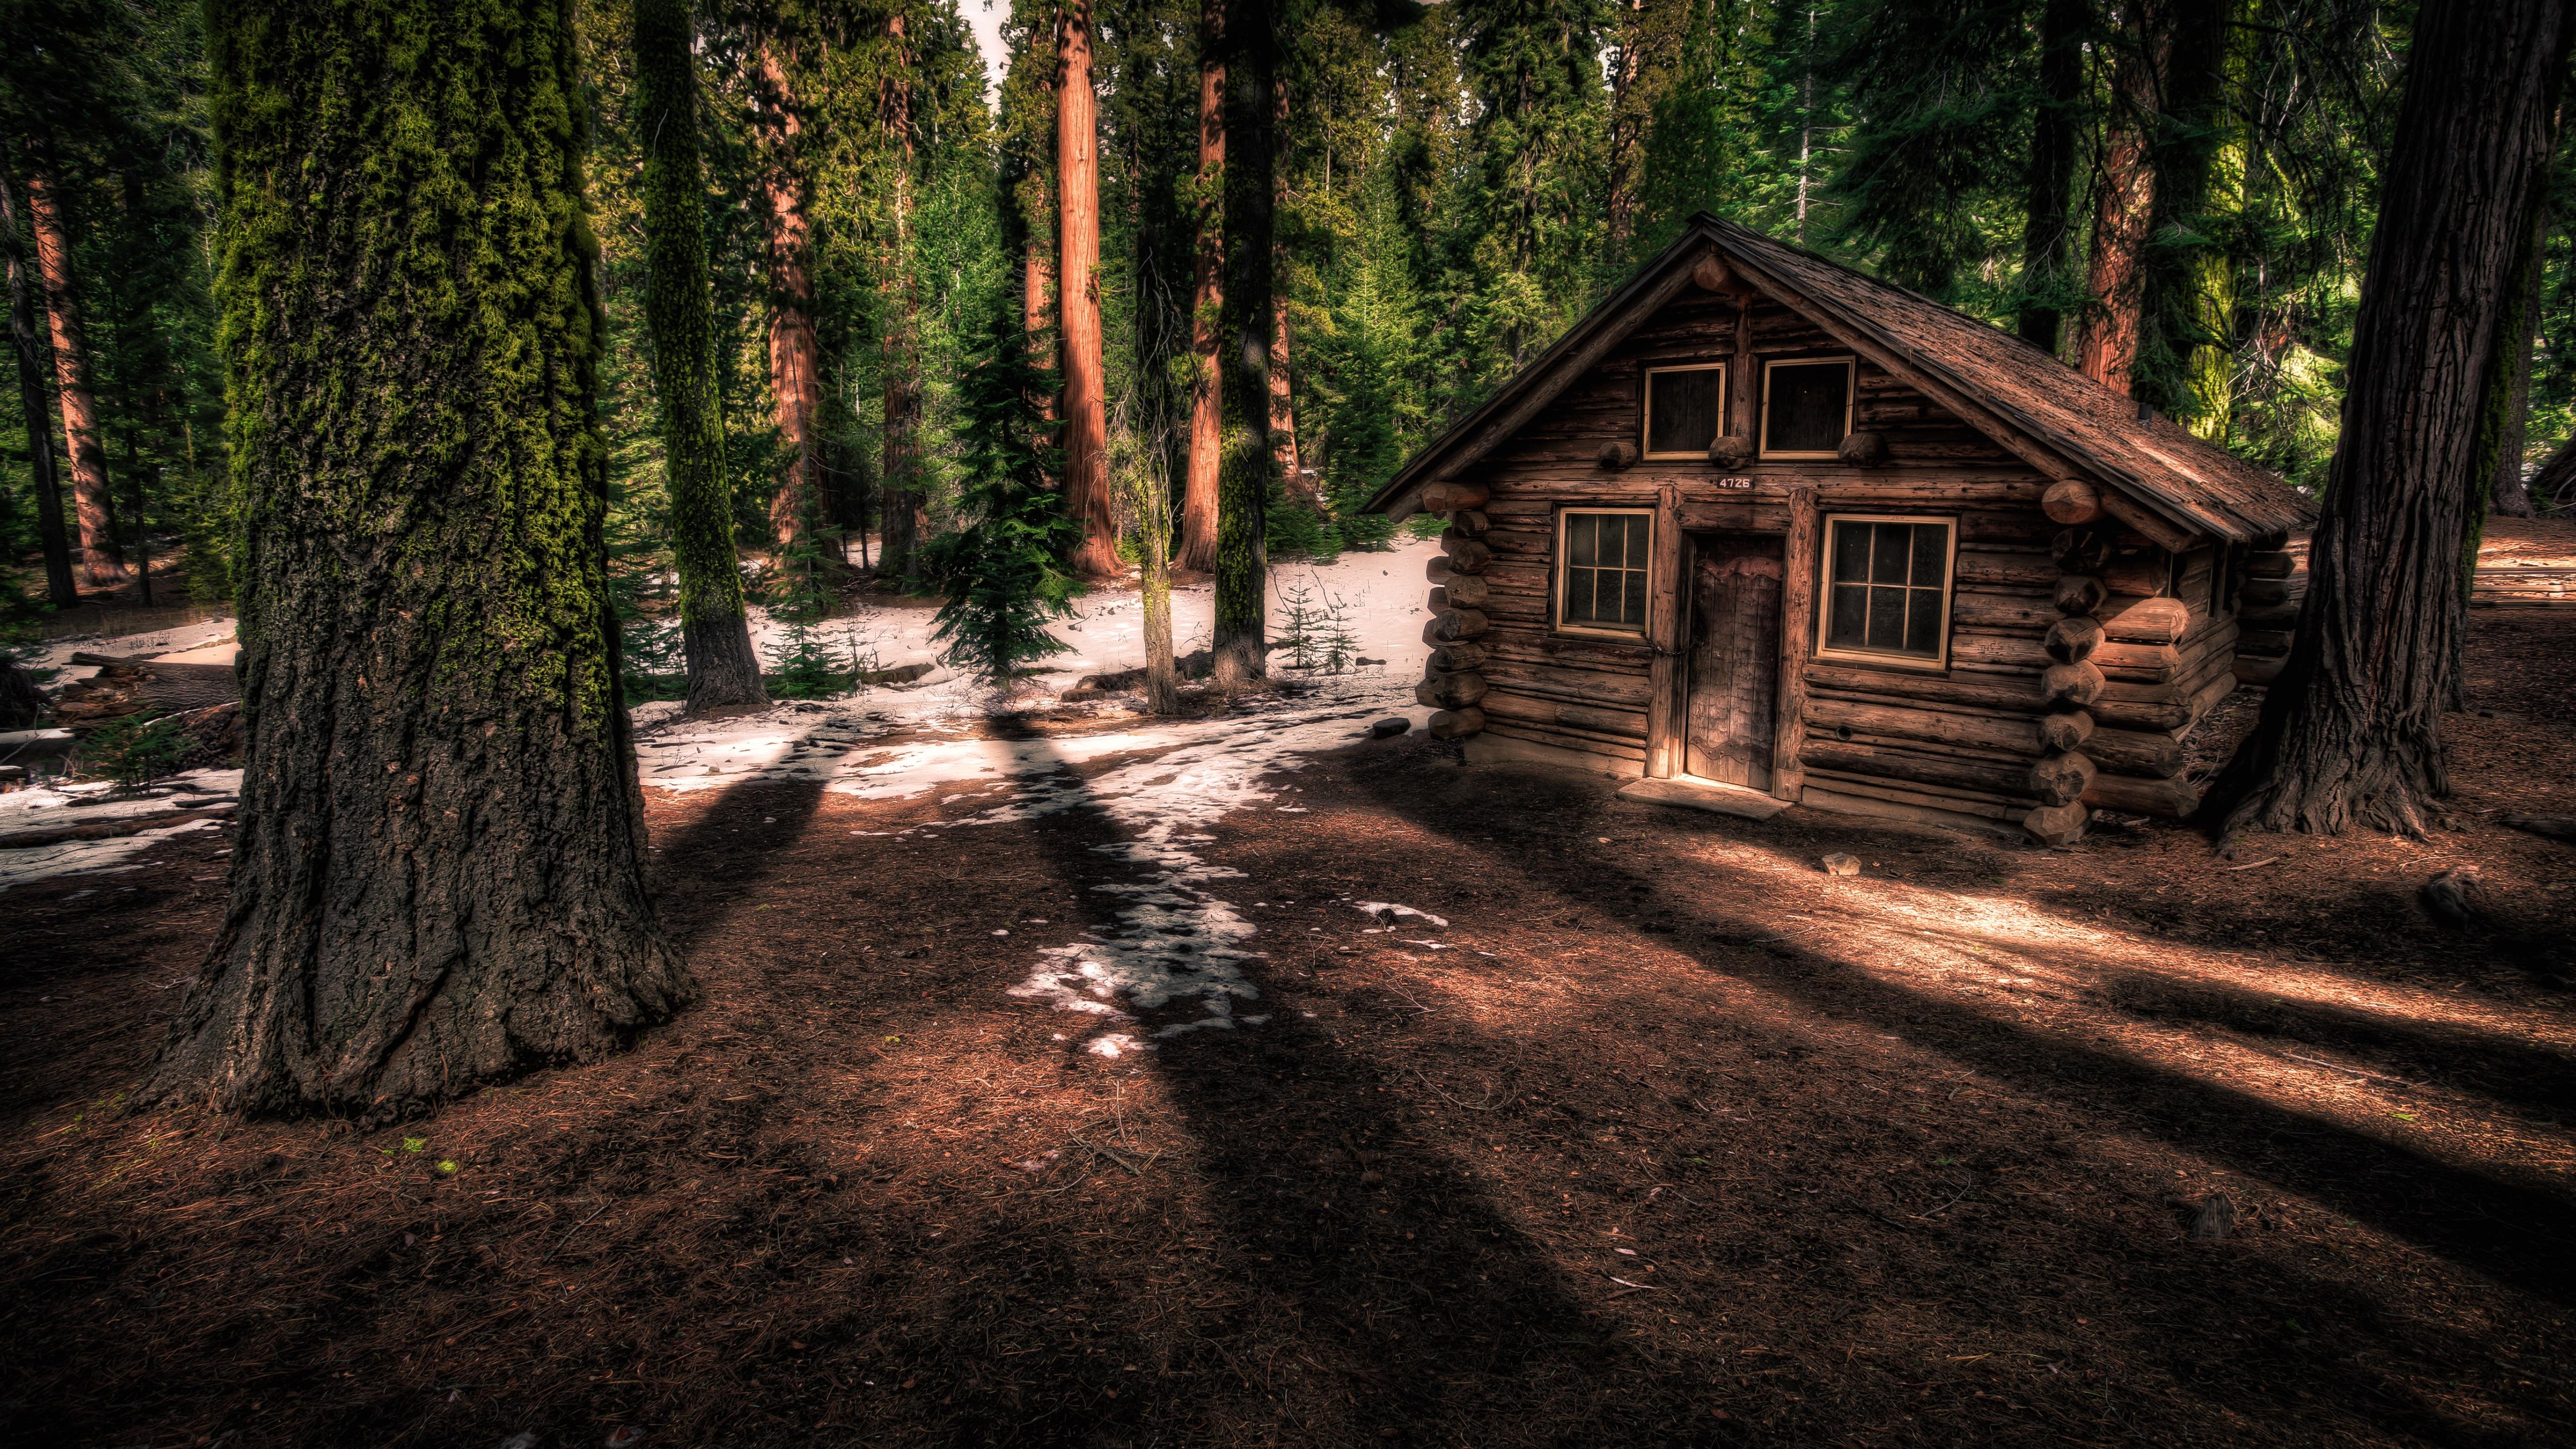 Forest shelter in Yosemite National Park, California wallpaper